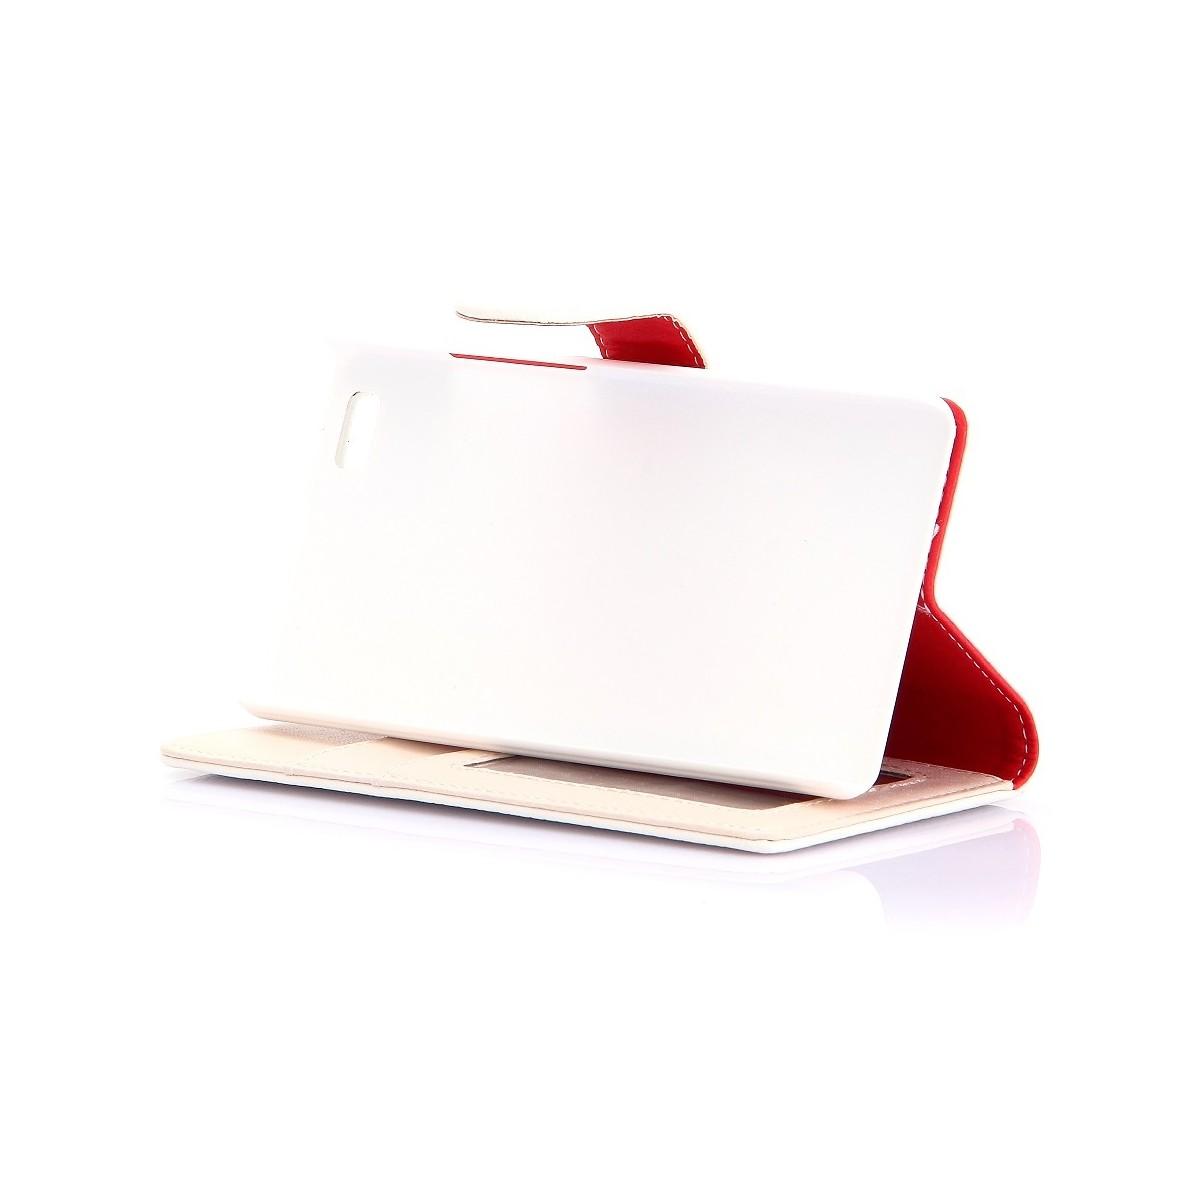 Etui Huawei P8 Lite Portecartes Blanc - Crazy Kase